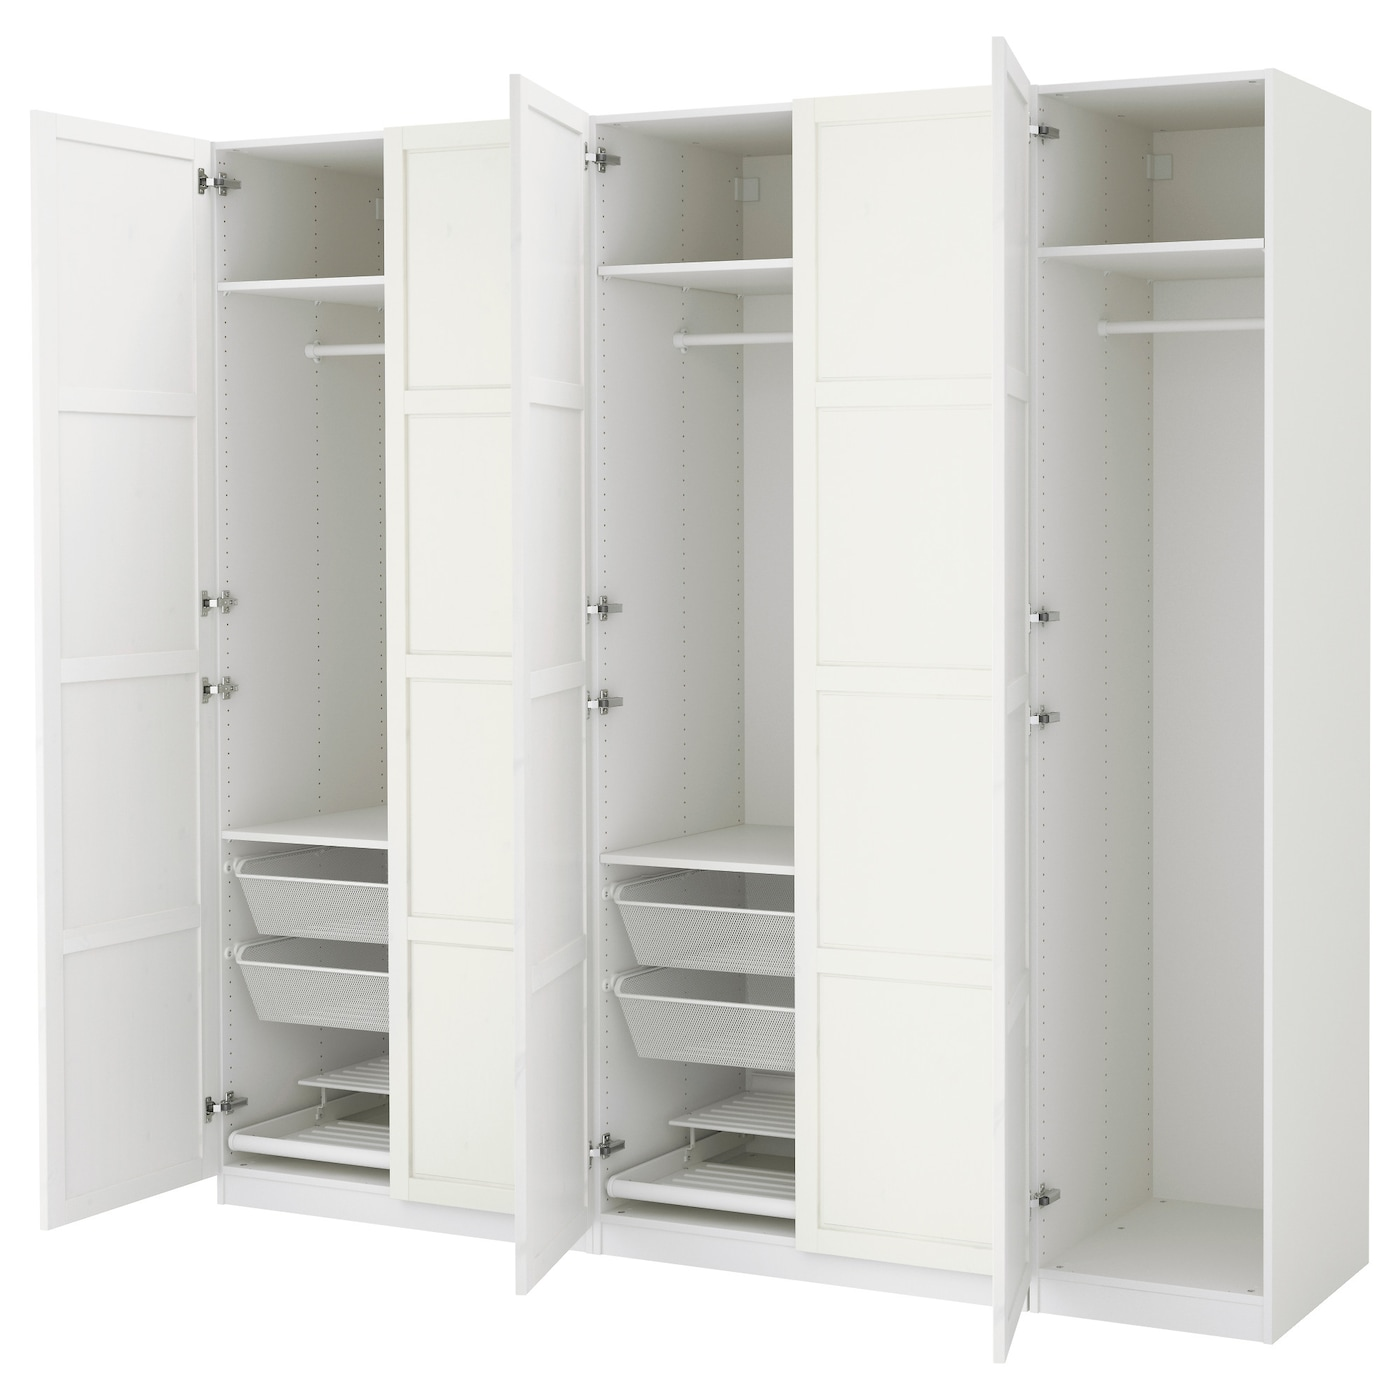 pax wardrobe white hemnes white stain 250x60x236 cm ikea. Black Bedroom Furniture Sets. Home Design Ideas